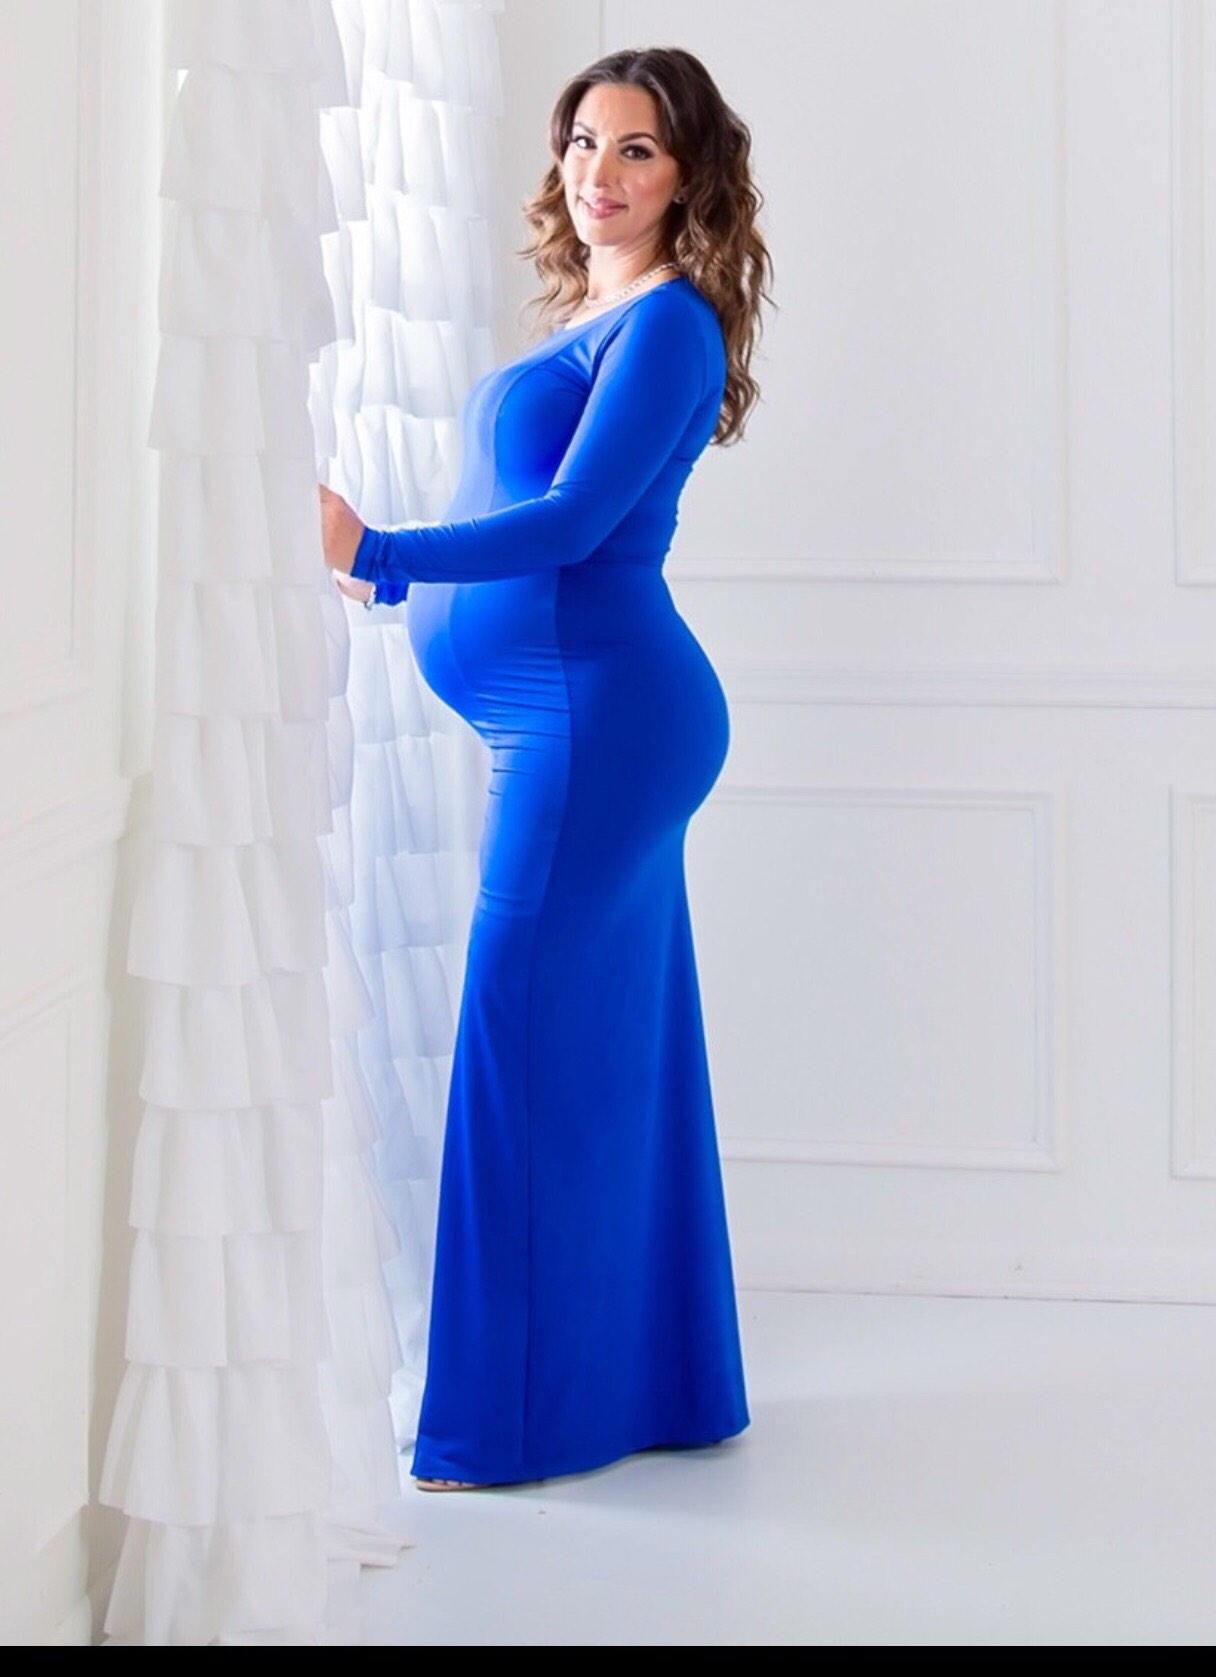 b0abfb7901e97e Vrouwen lange mouwen lange moederschap Maxi jurk   moederschap